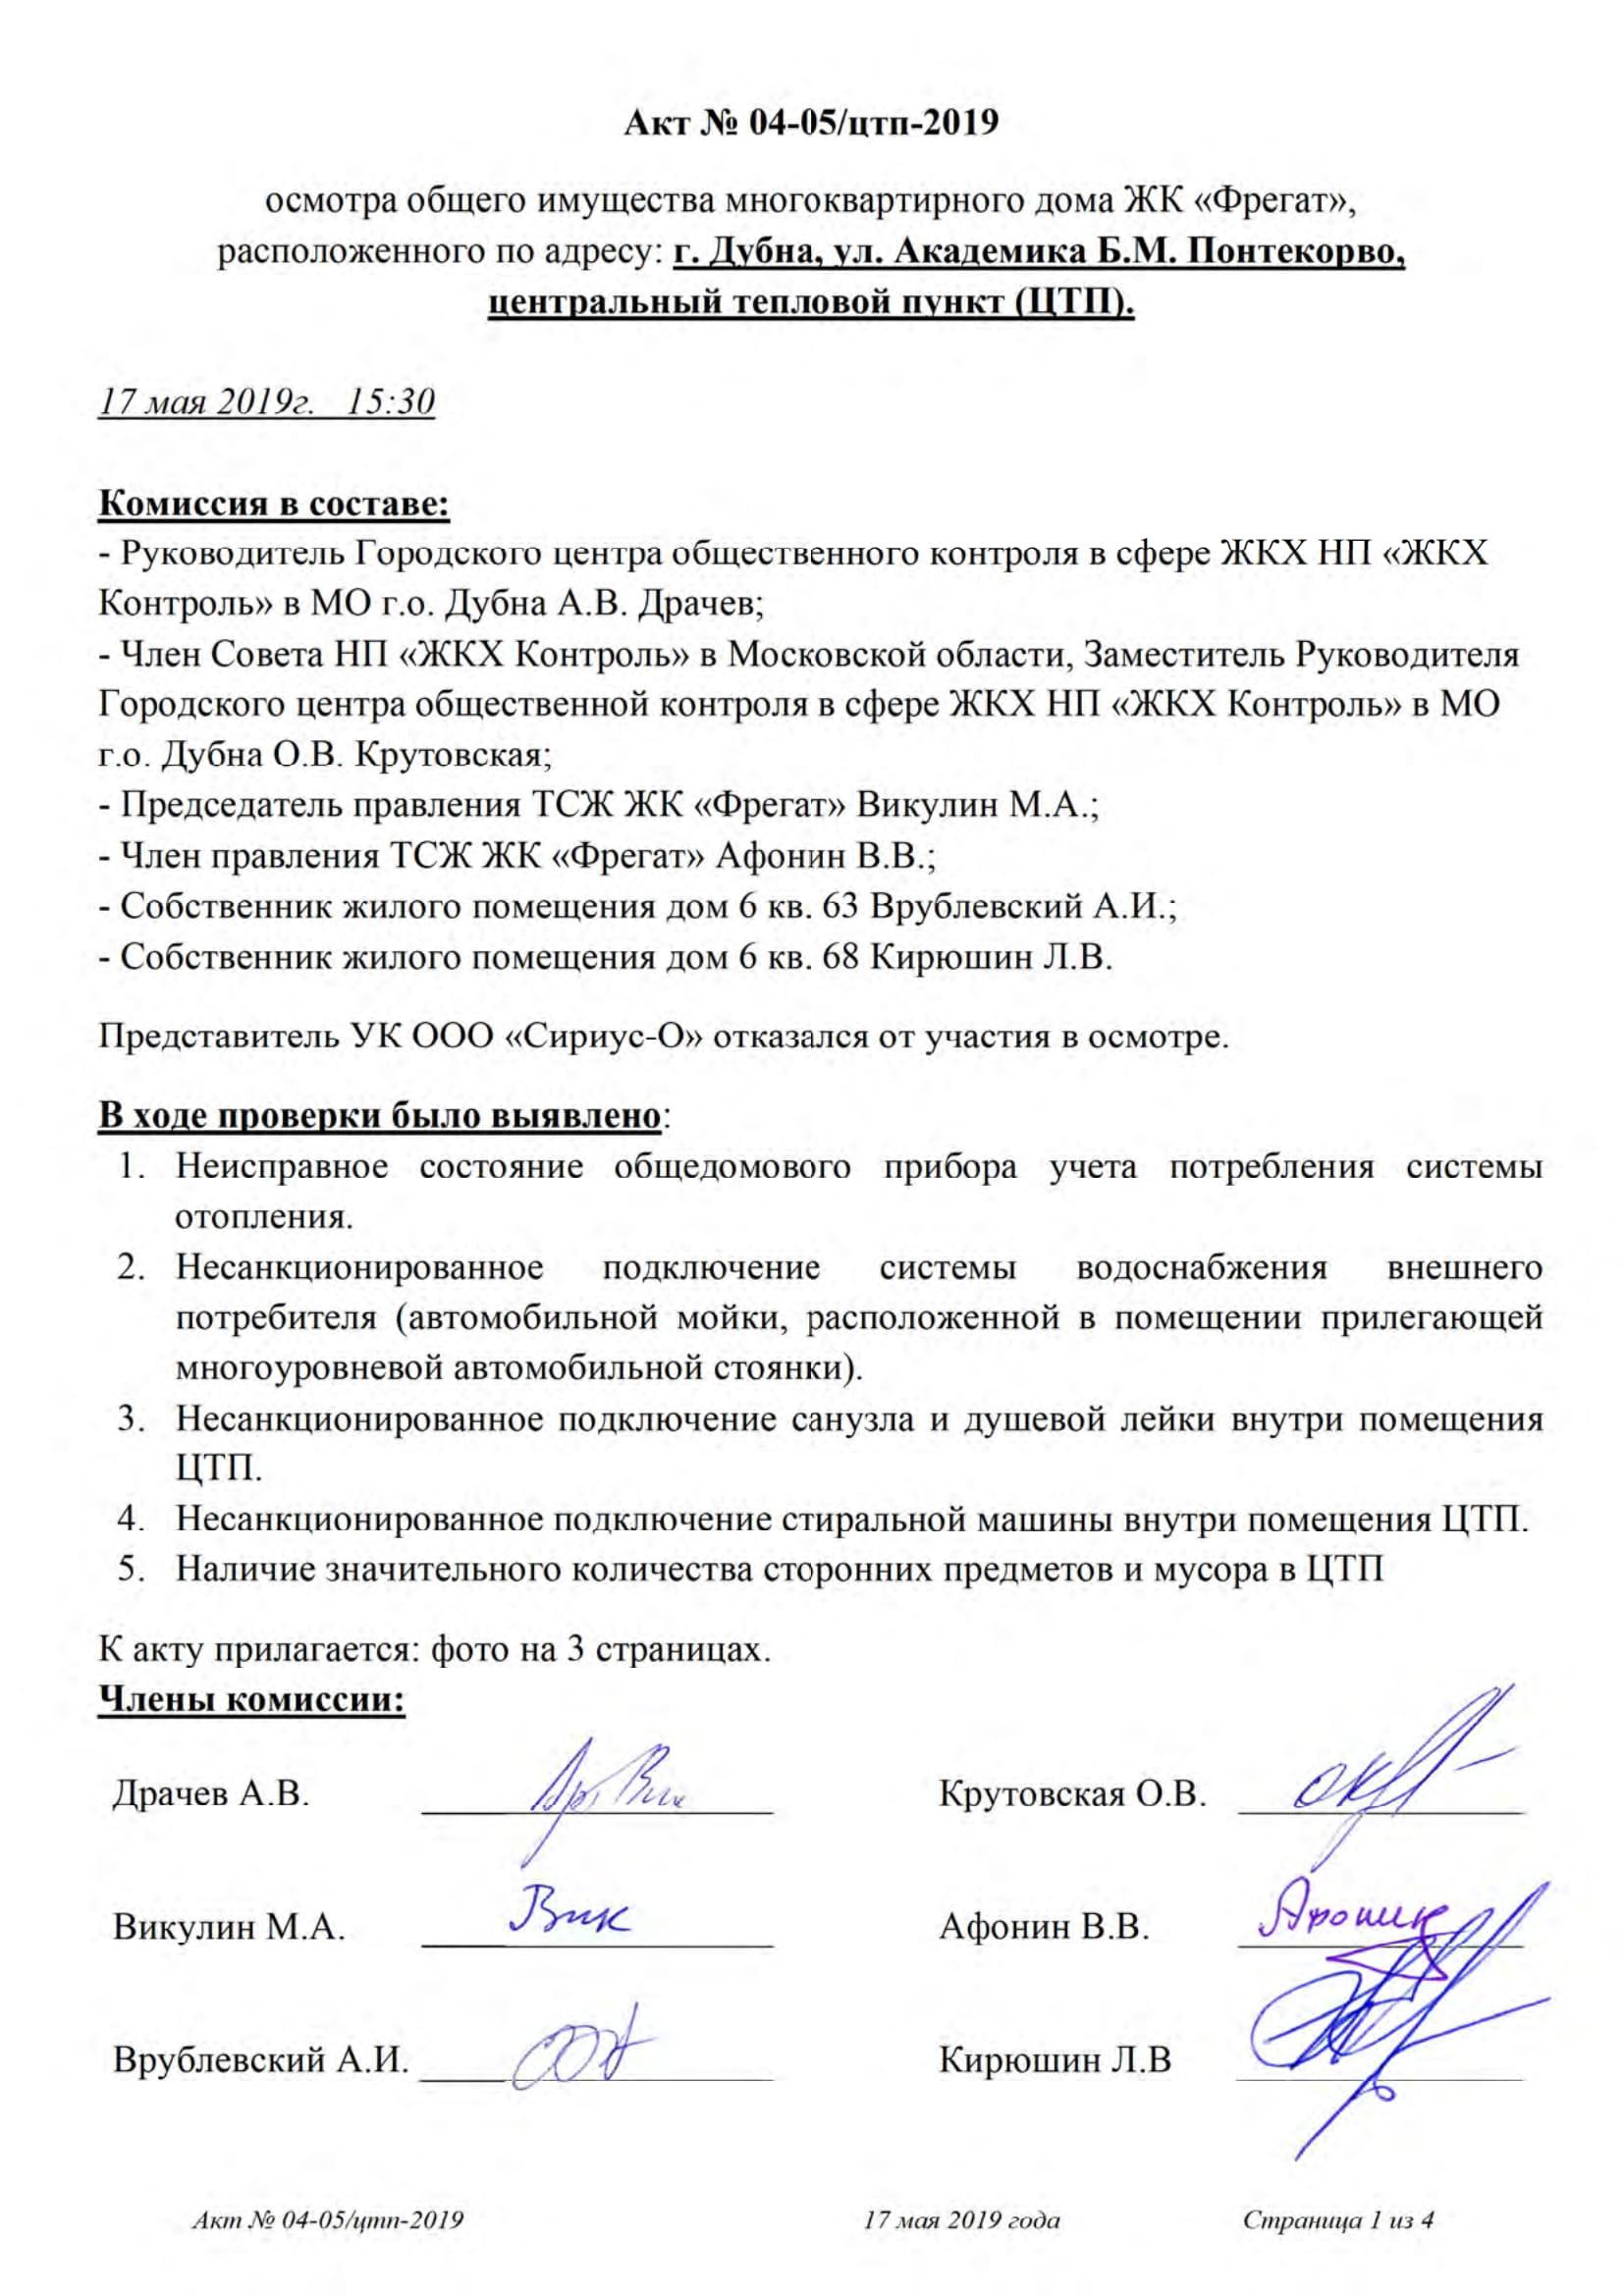 ЖКХ-Контроль-АКТ-Фрегат_цтп-4_sign_imgS-1